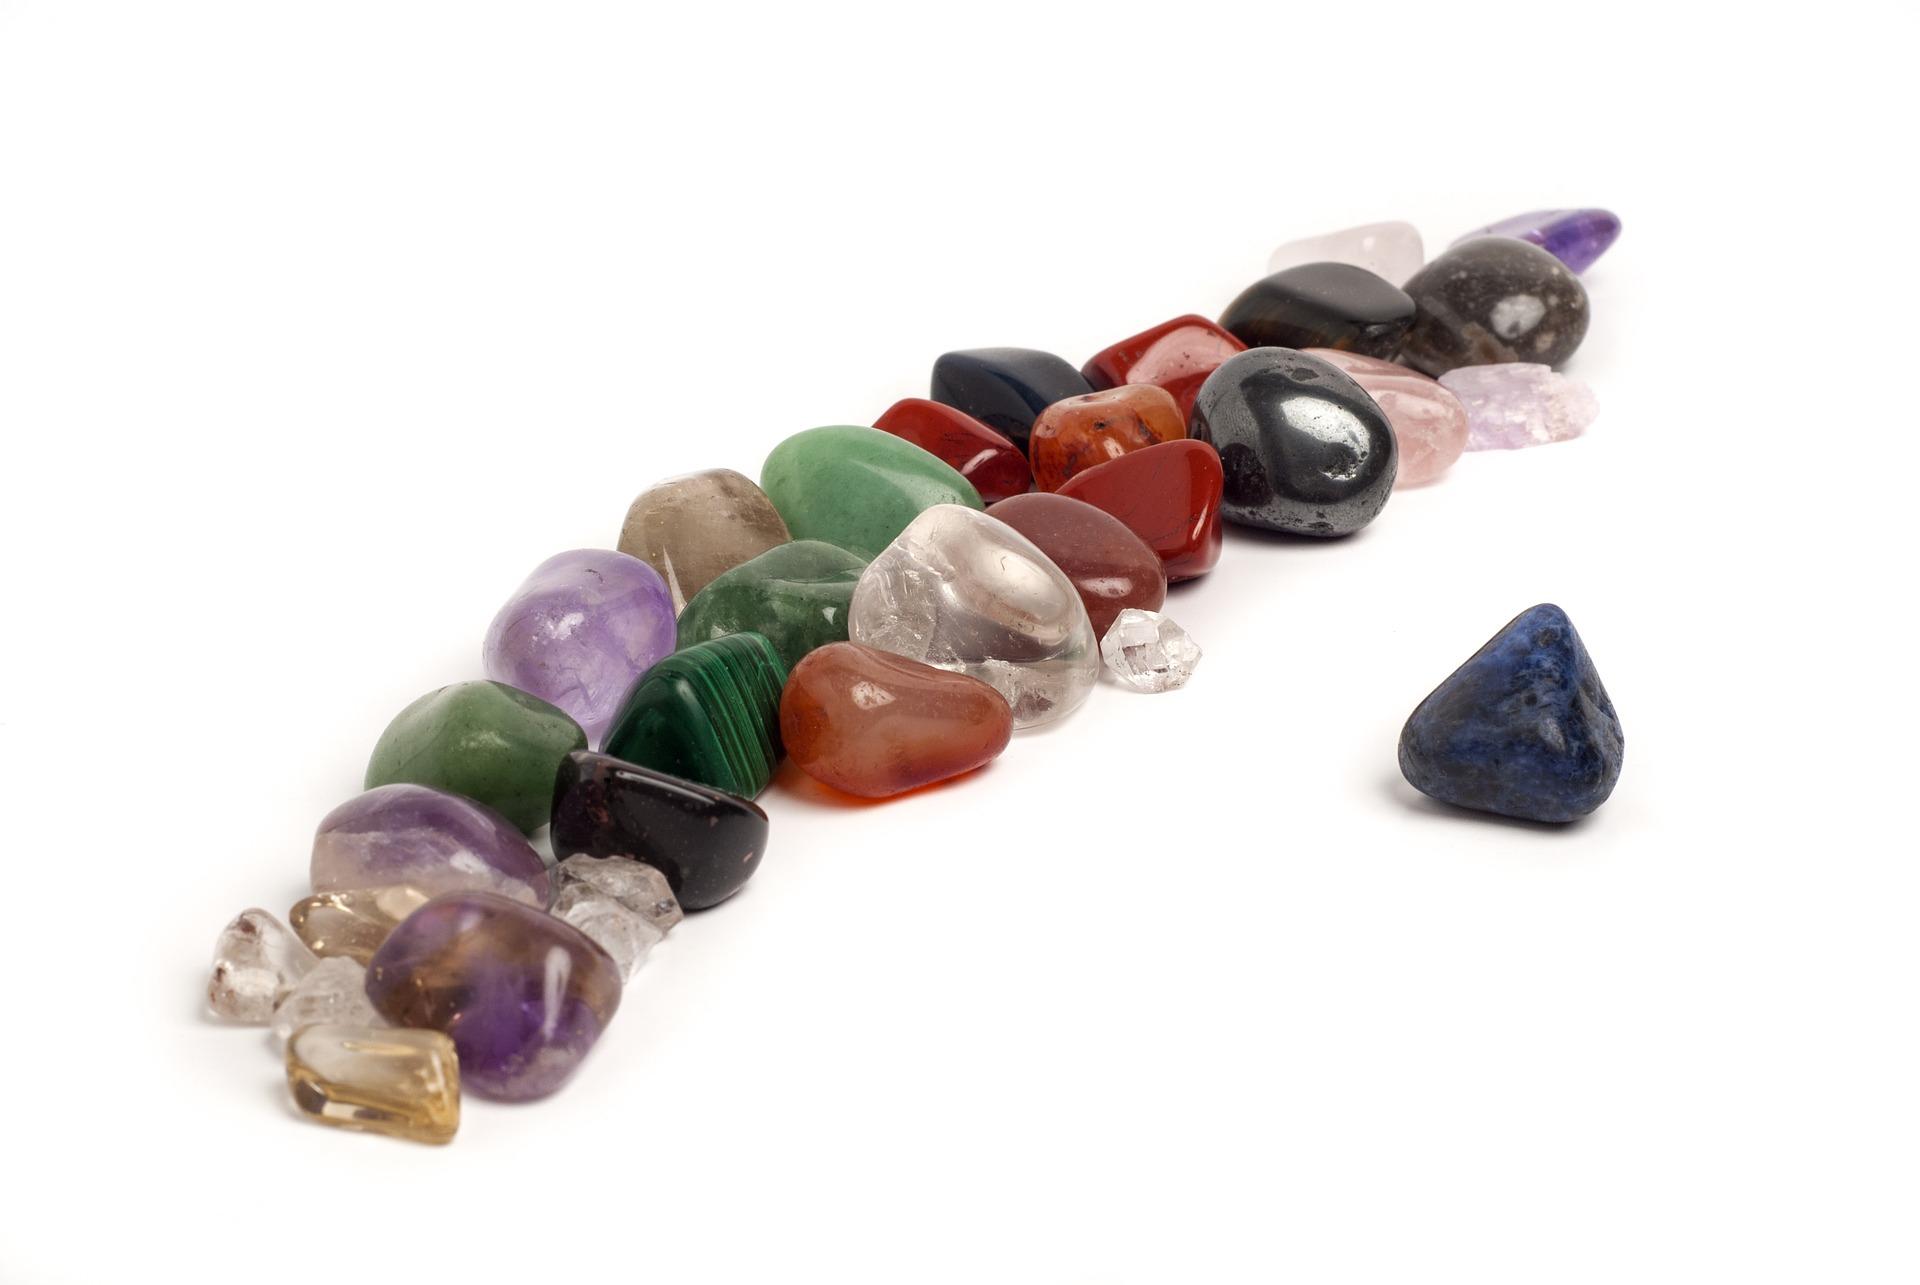 Crystals, Gemstones, Minerals, Crystal Healing